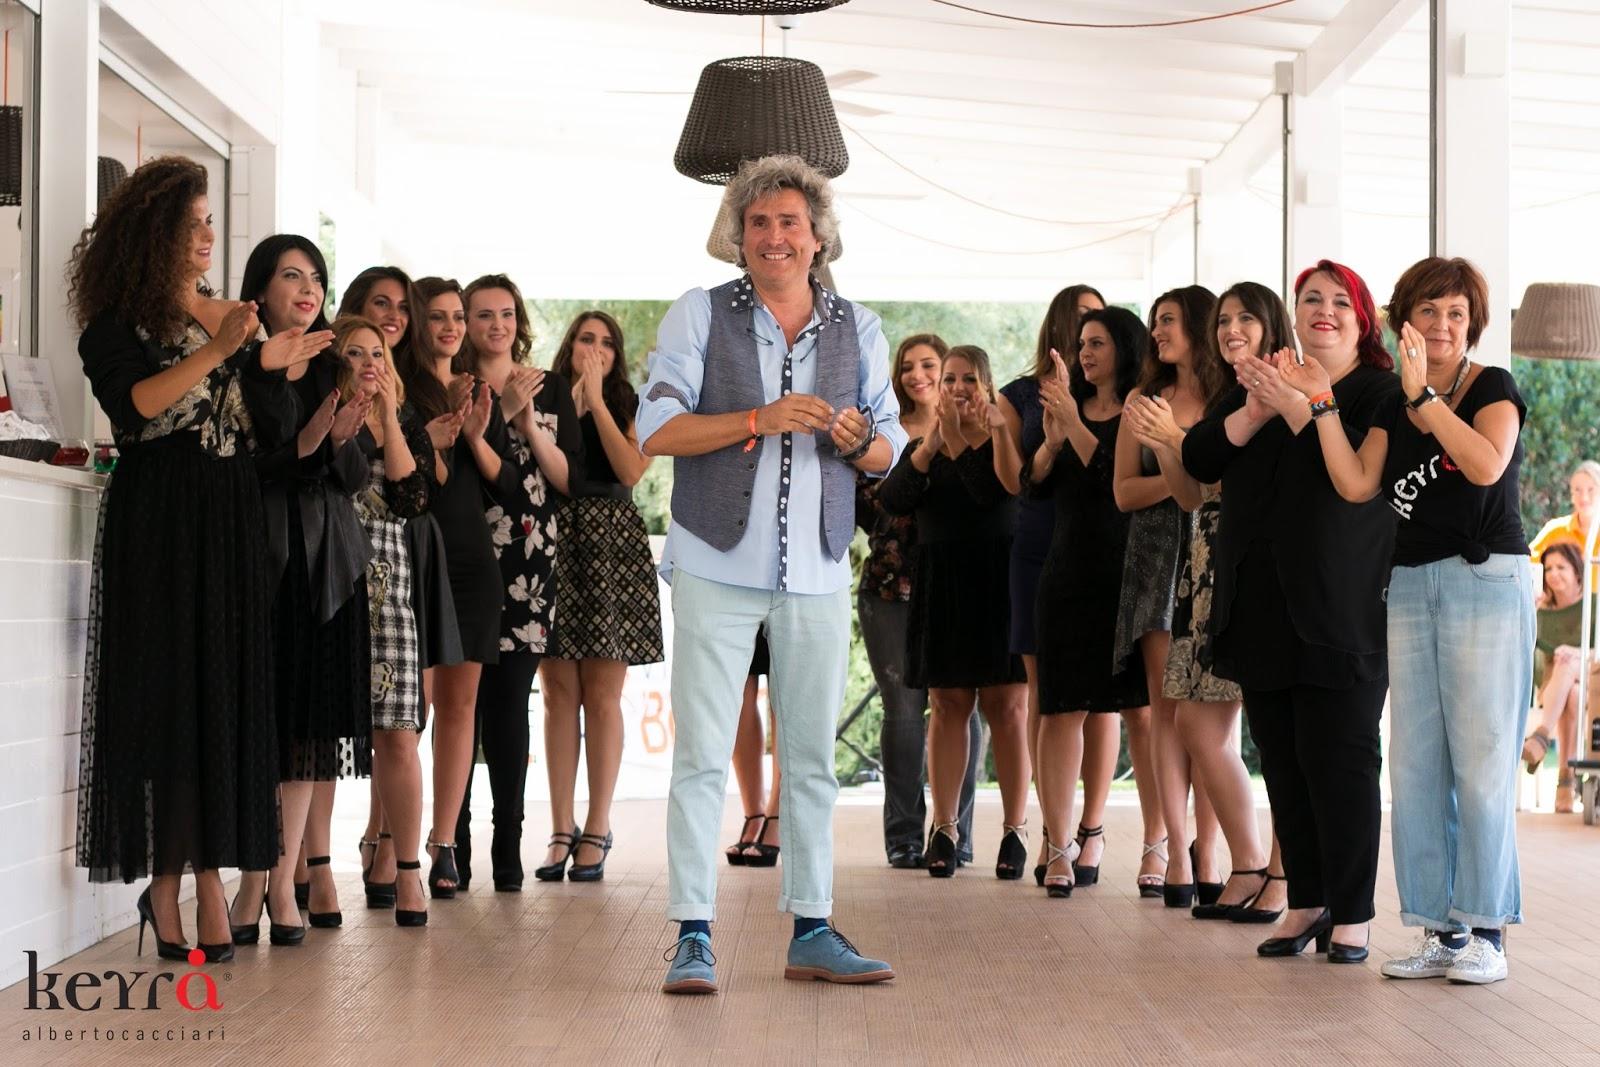 Keyrà, Alberto Cacciari, Curvy, Iris Tinunin, Keyrà Curvy Festival,sfilata